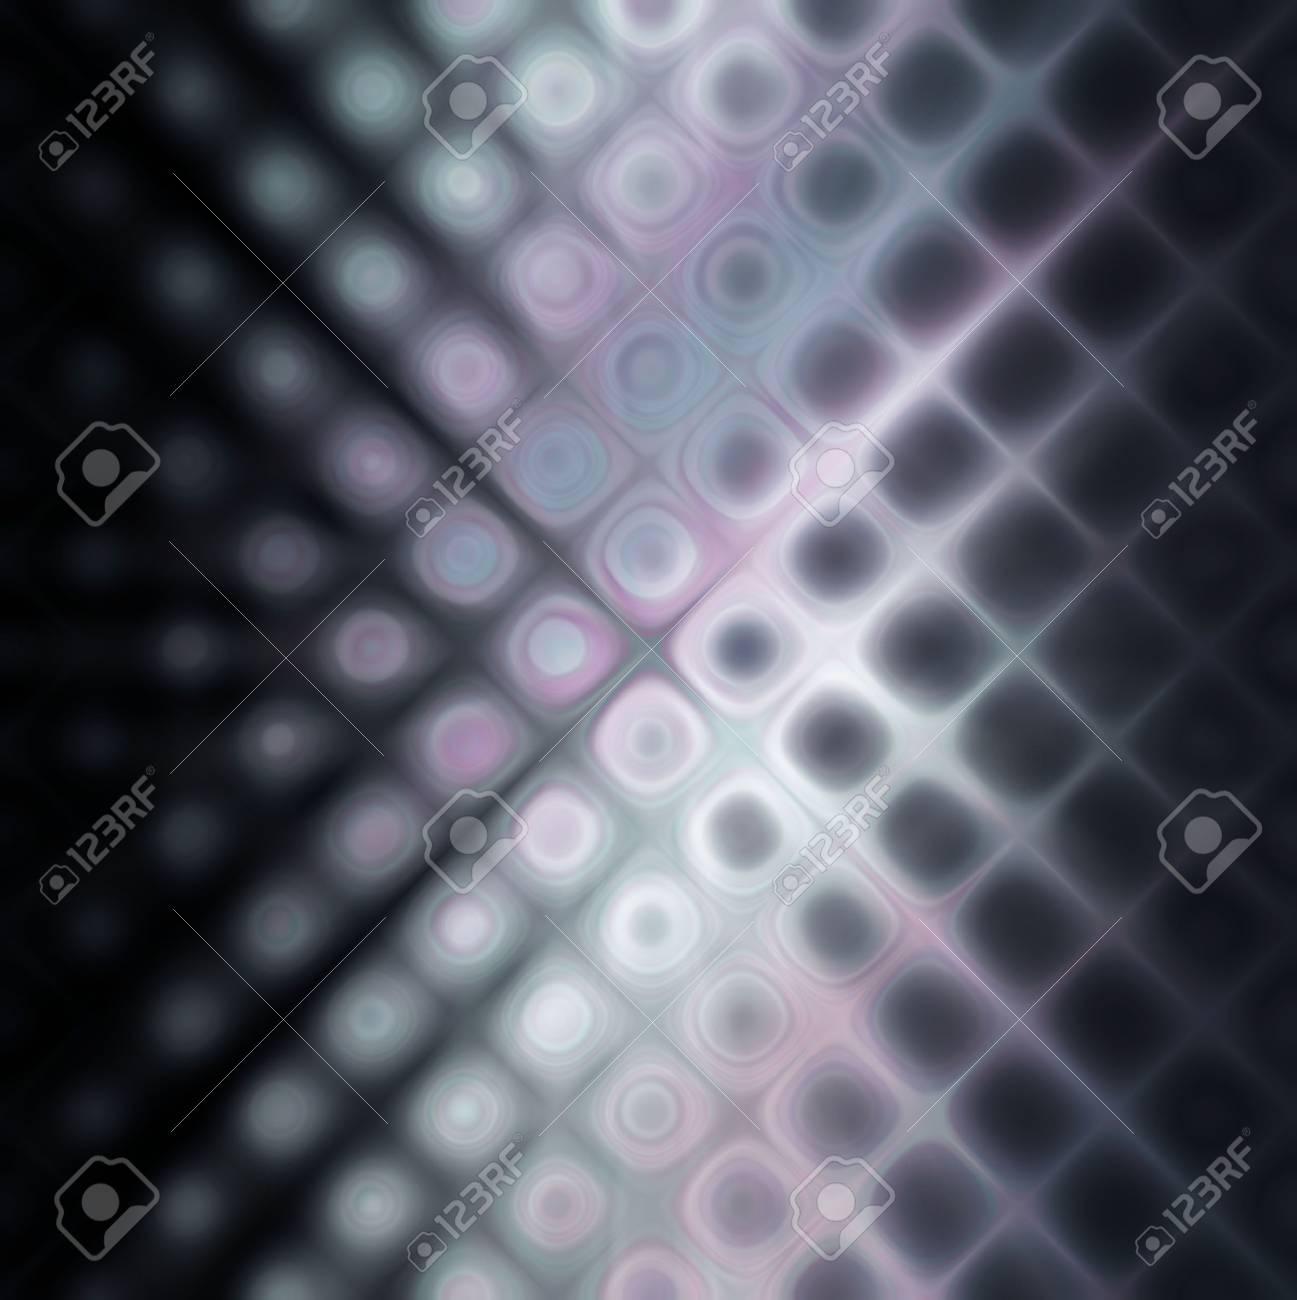 abstract light background. Raster illustration Stock Photo - 17682679